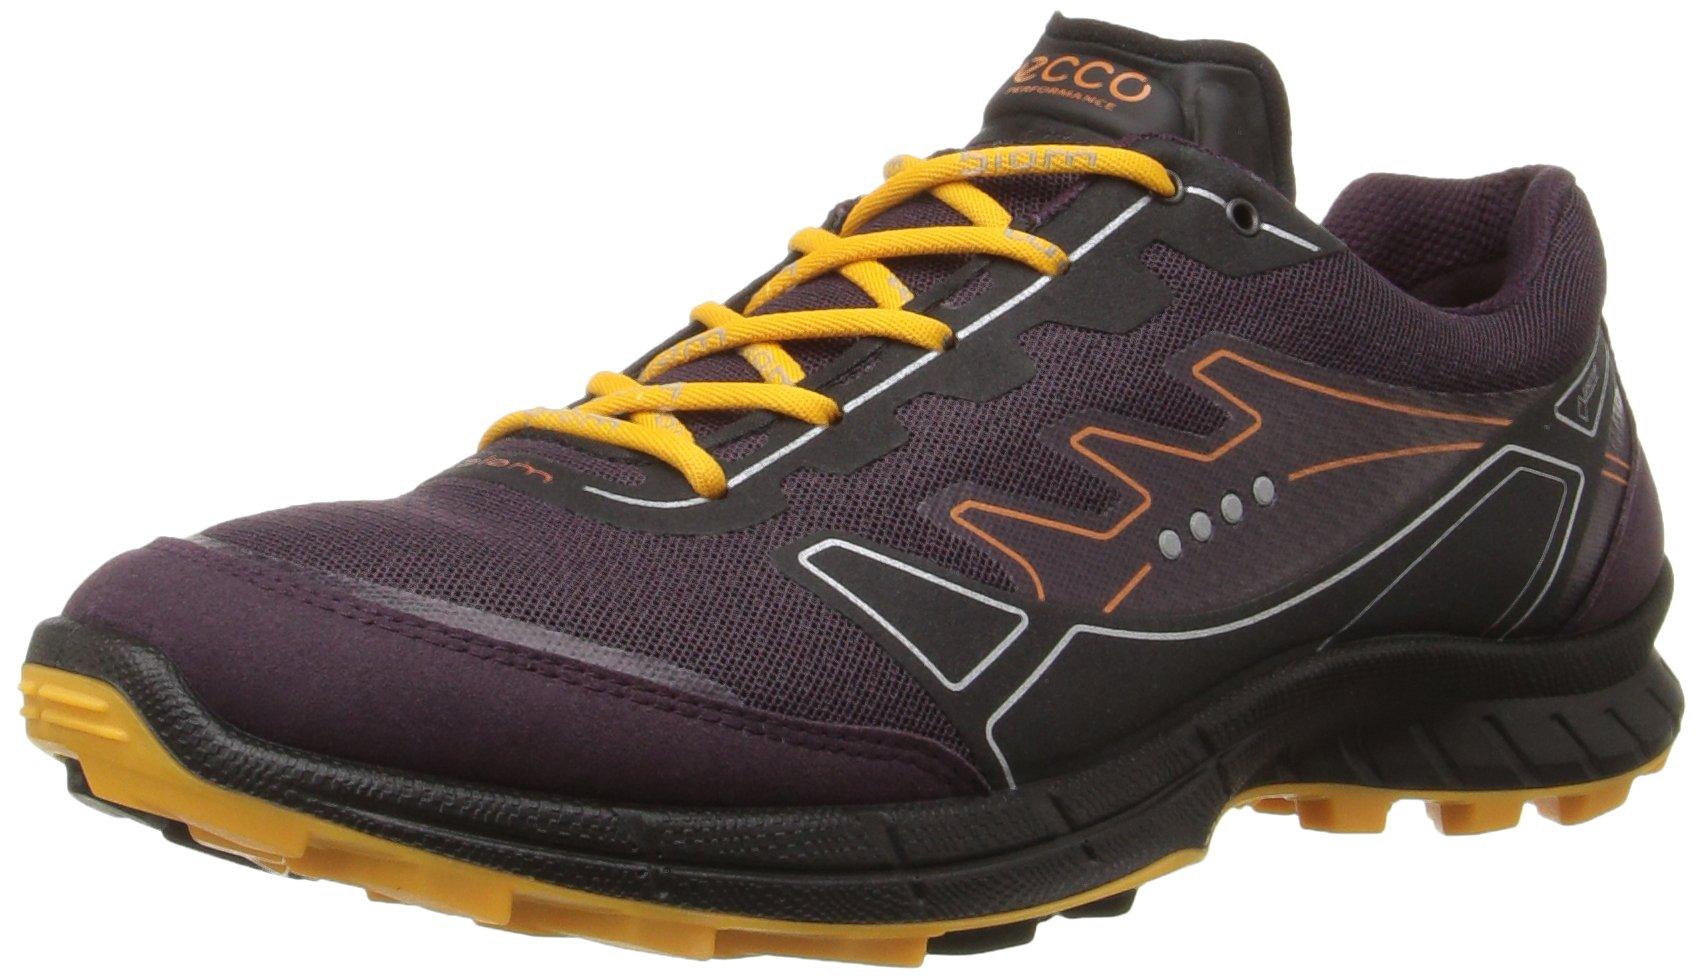 ECCO Women's Biom FL Gore-Tex-W Trail Running Shoe, Mauve/Fanta, 42 EU/11-11.5 M US